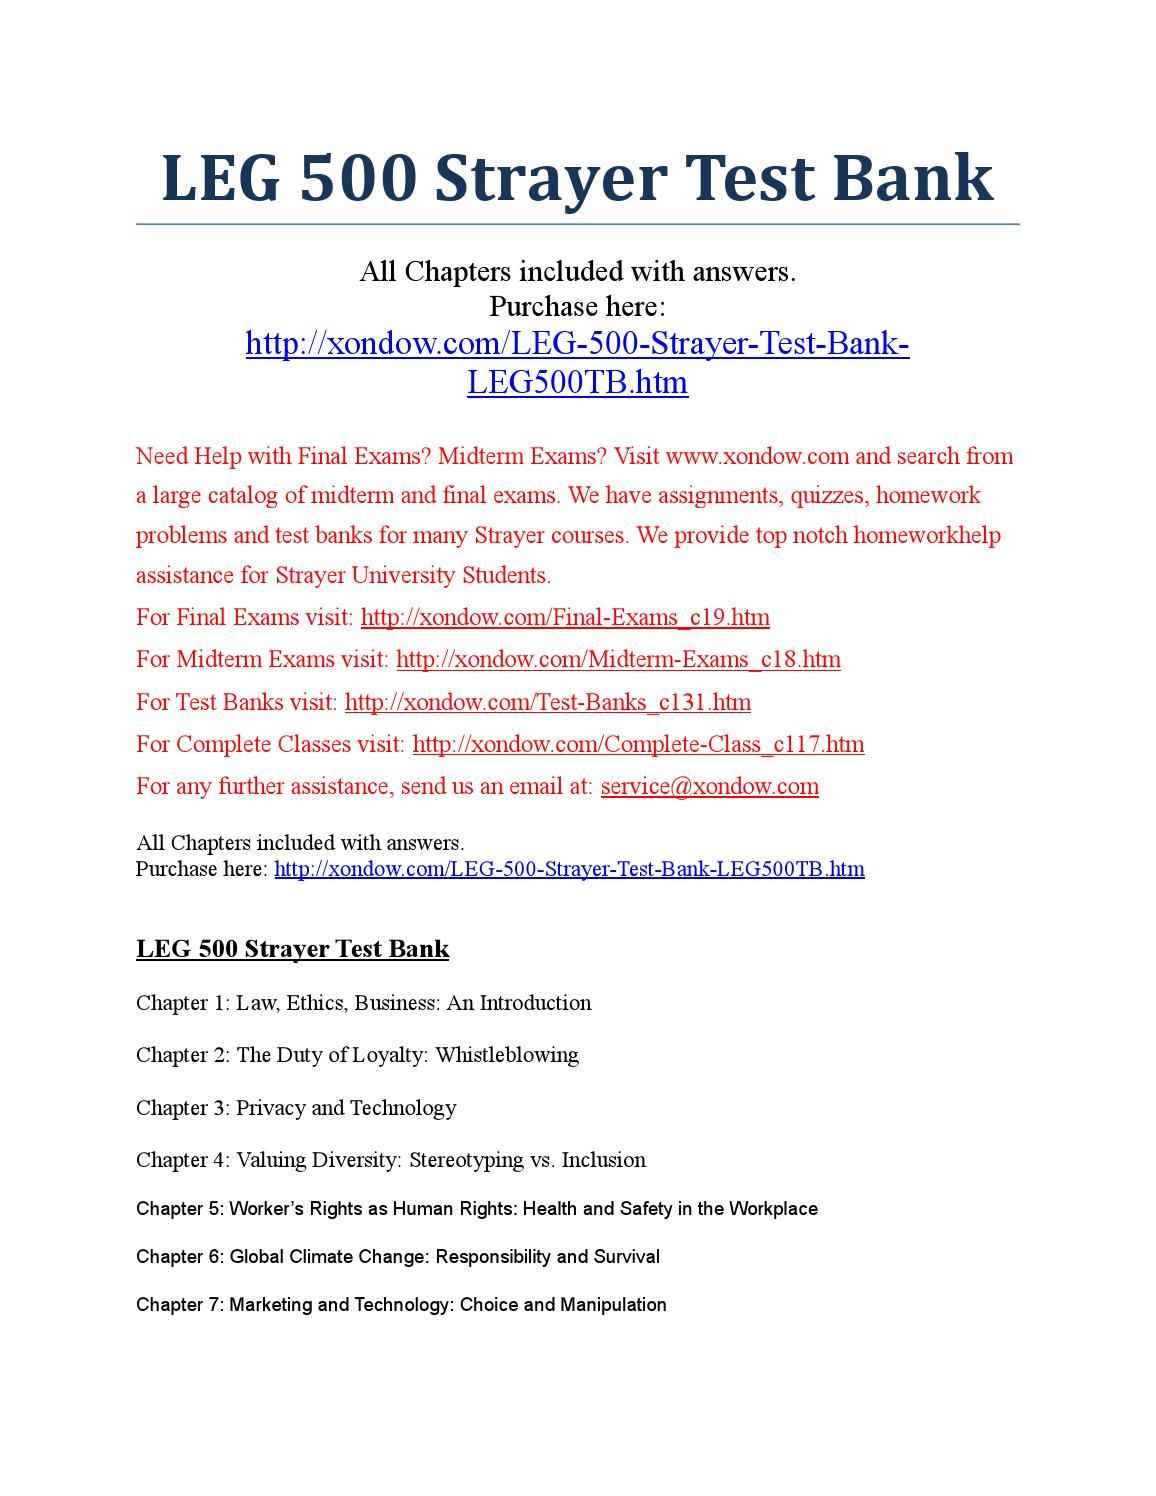 Strayer Cis500 Assignment 1